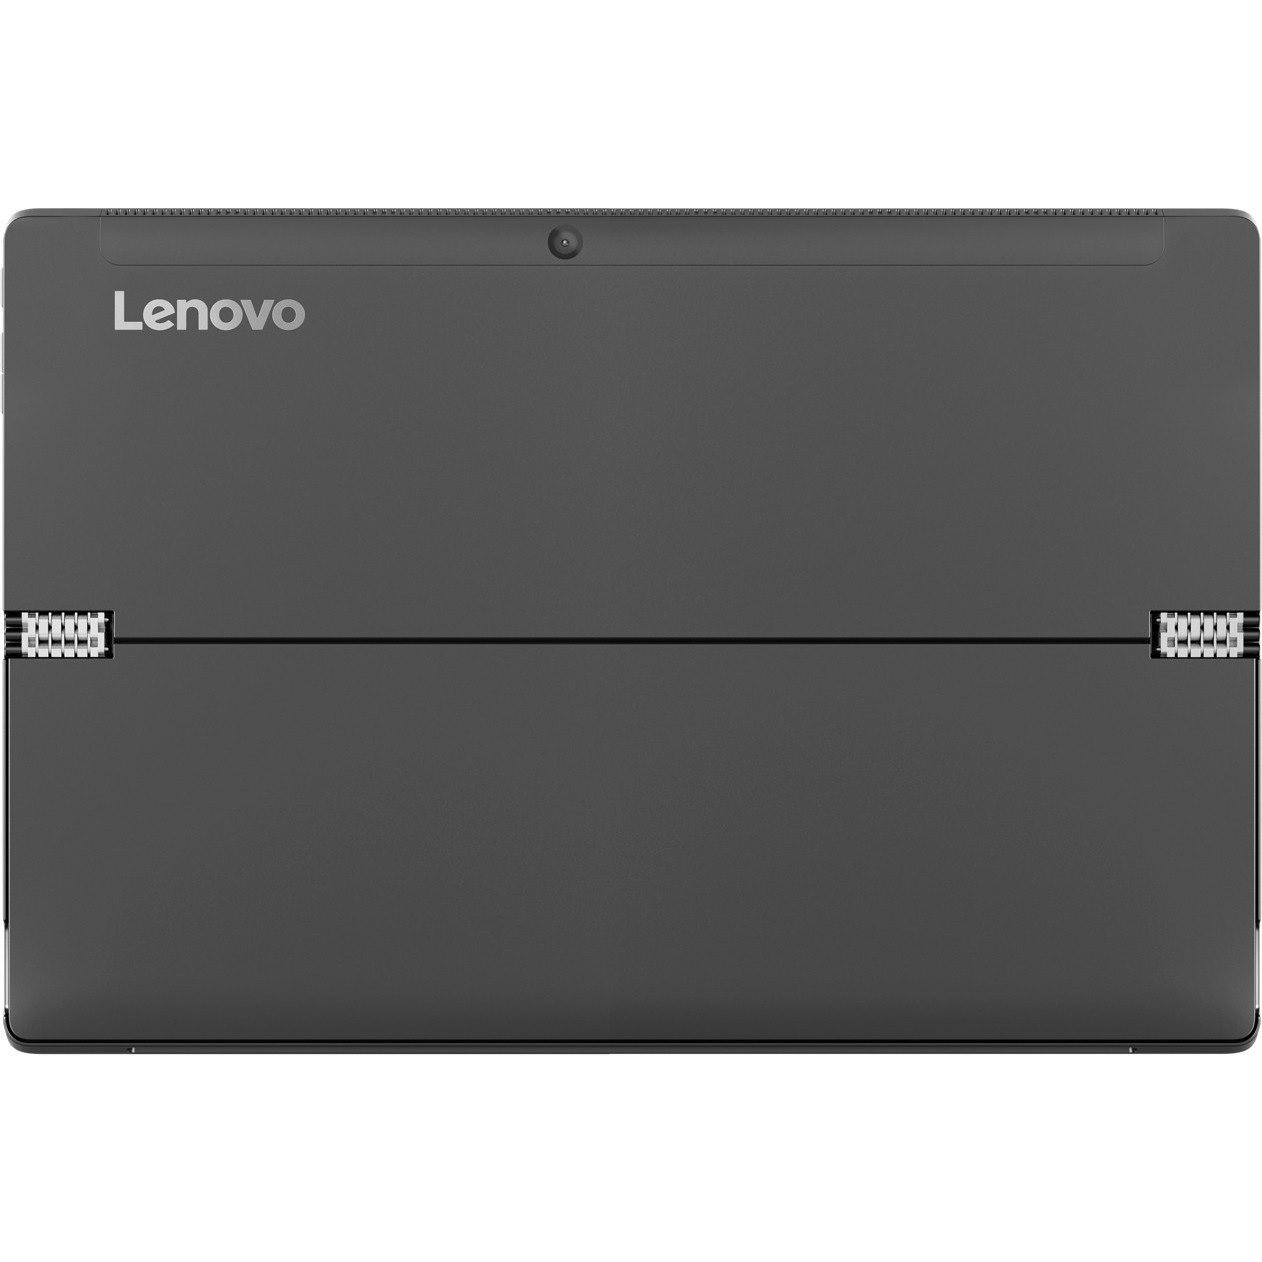 "Lenovo Miix 520-12IKB 20M3003WAU 31 cm (12.2"") Touchscreen 2 in 1 Notebook - 1920 x 1200 - Intel Core i5 (8th Gen) i5-8250U Quad-core (4 Core) 1.60 GHz - 8 GB RAM - 256 GB SSD - Iron Grey"